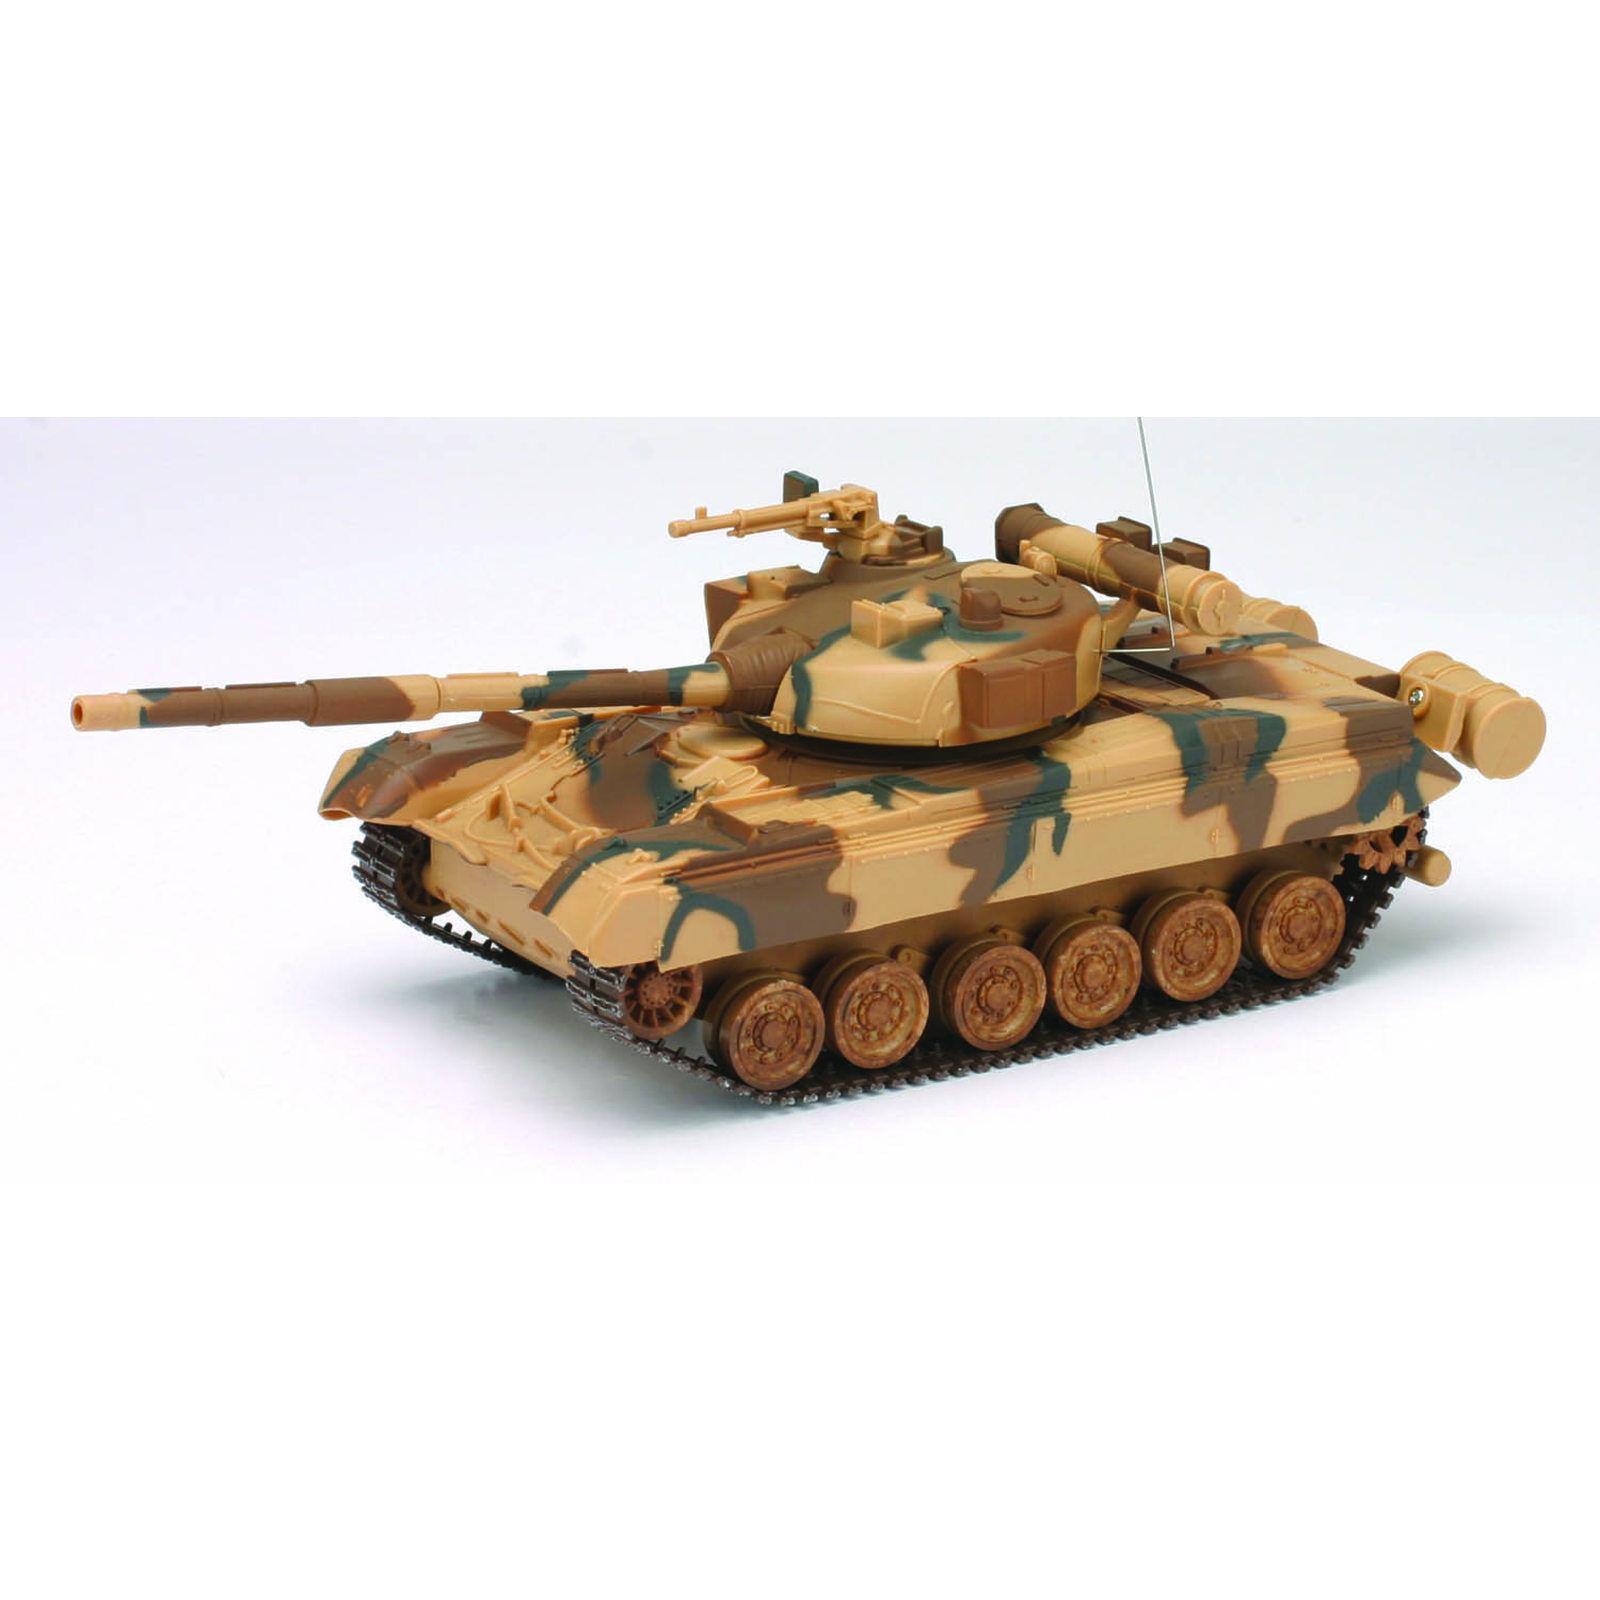 RC Panzer teledirigido 27mhz 1  3 2 HEAVY METAL